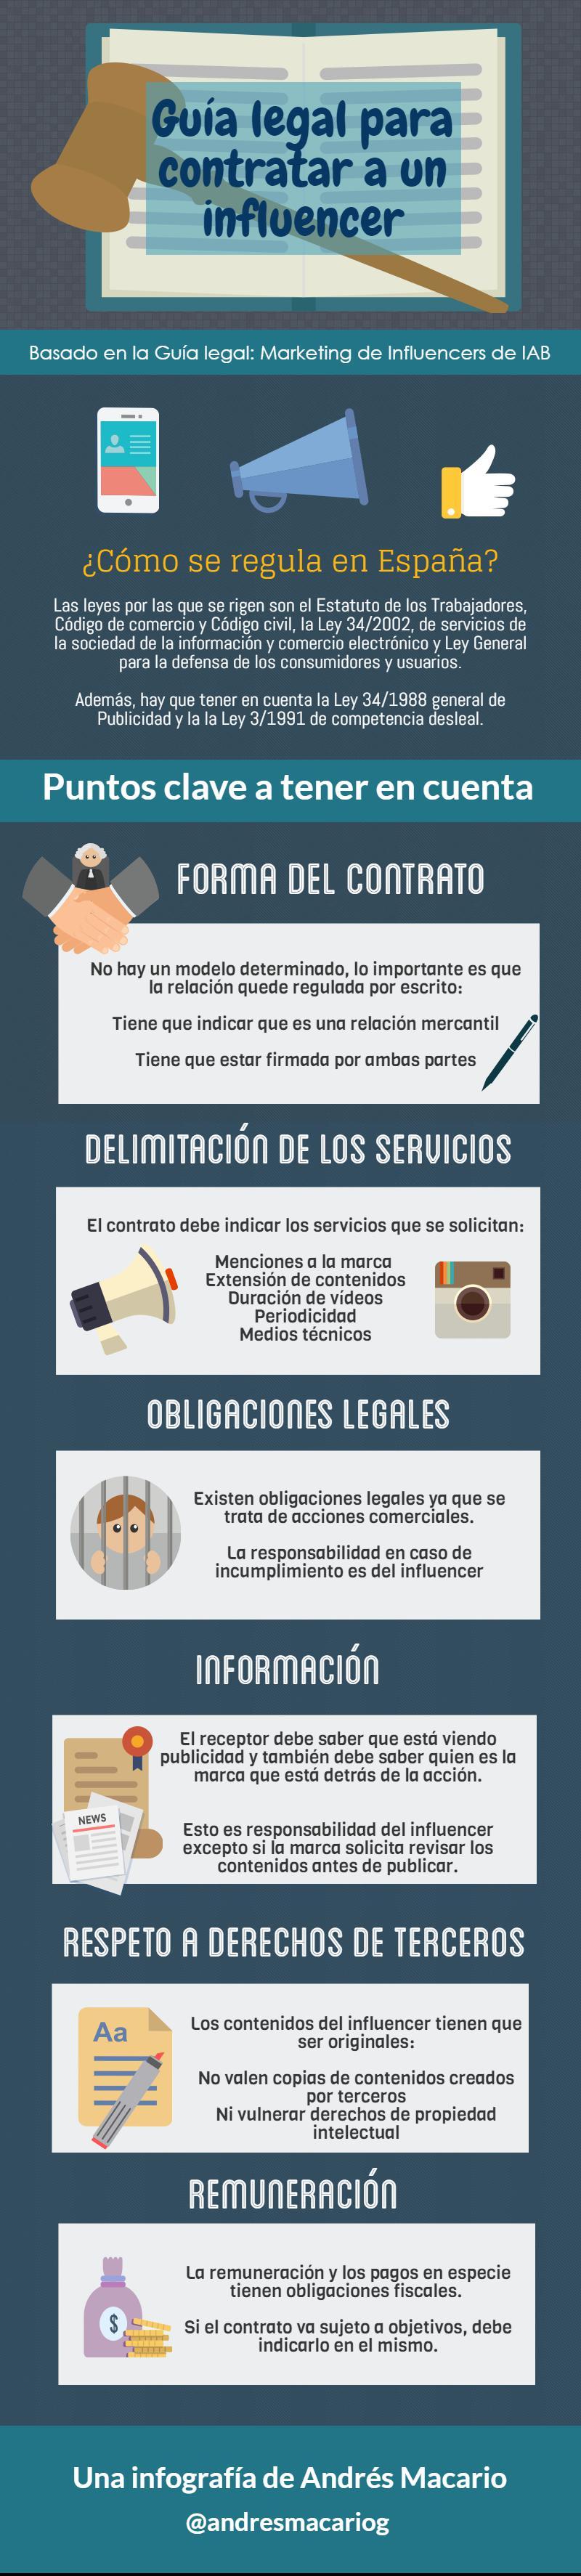 Guia legal para contratar a un influencer- Infografia Andres Macario